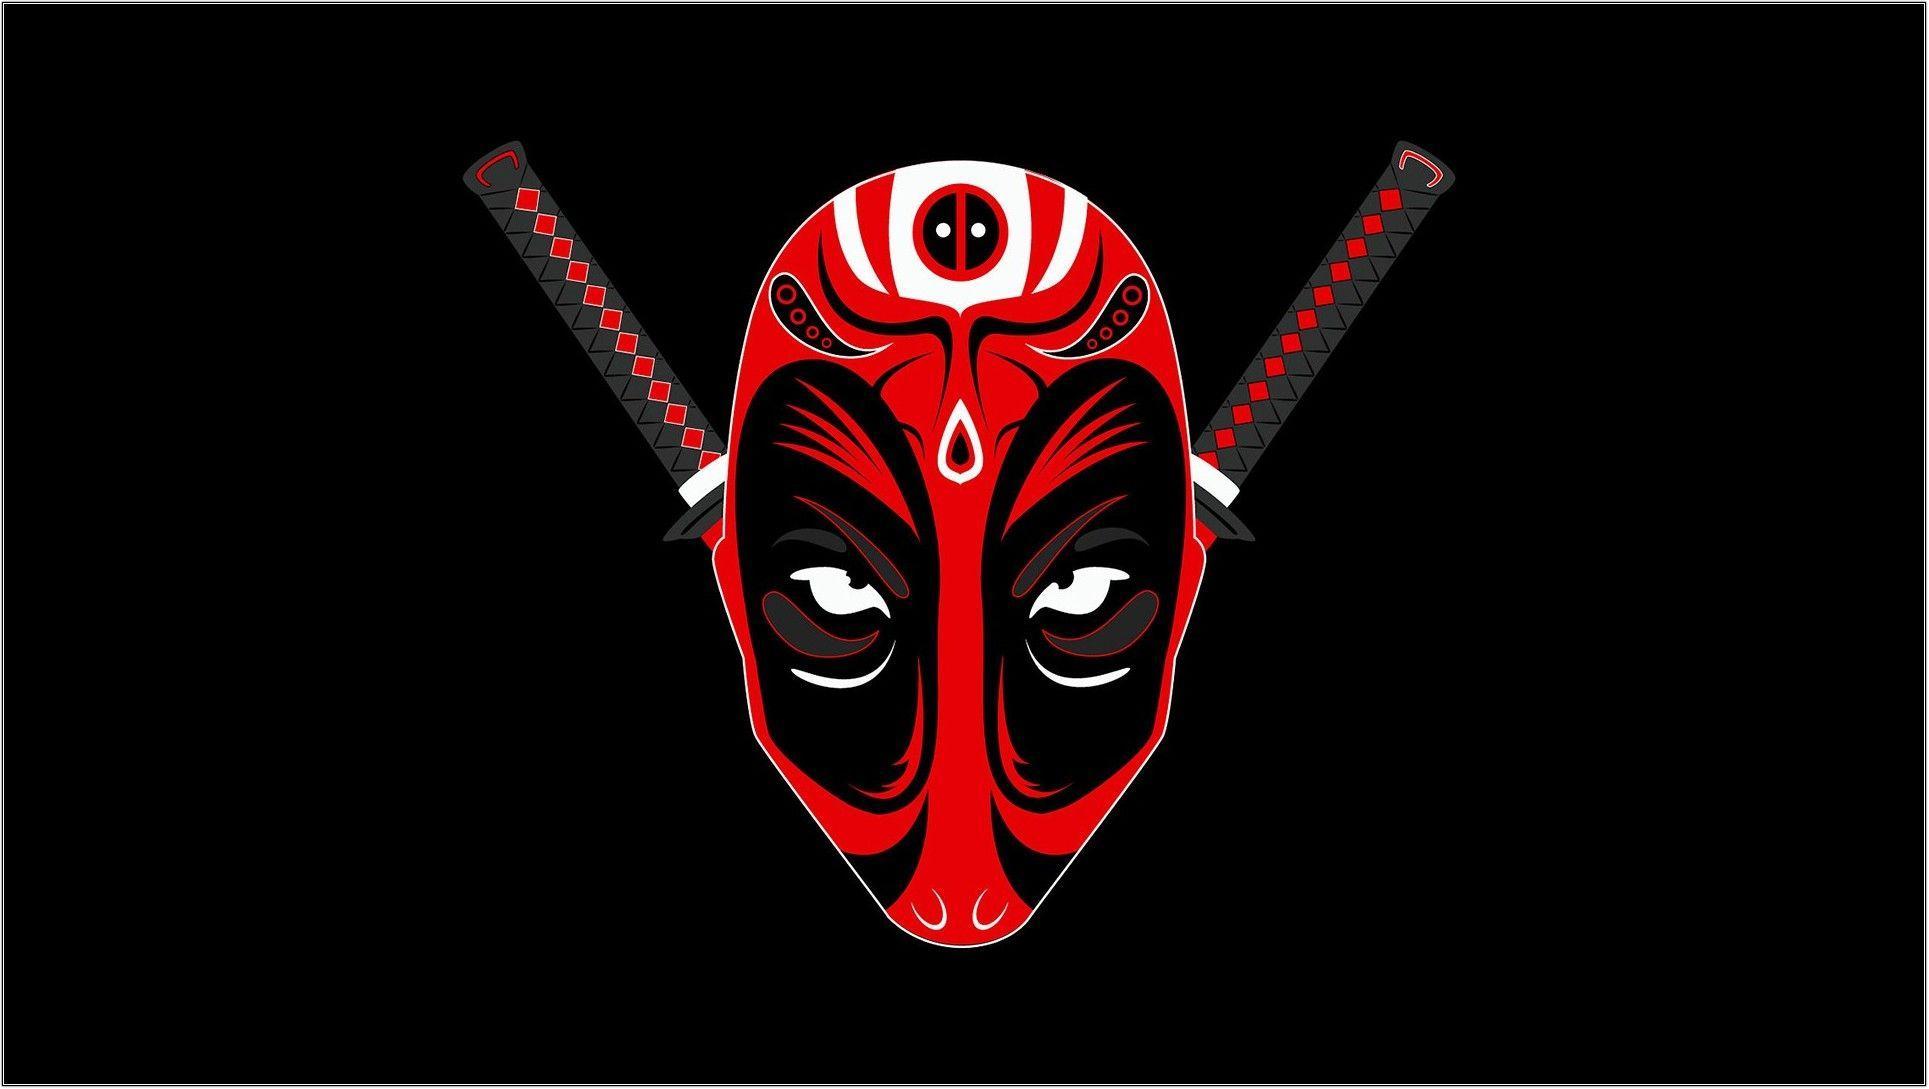 39 Best Free Deadpool Logo 4k Wallpapers Wallpaperaccess